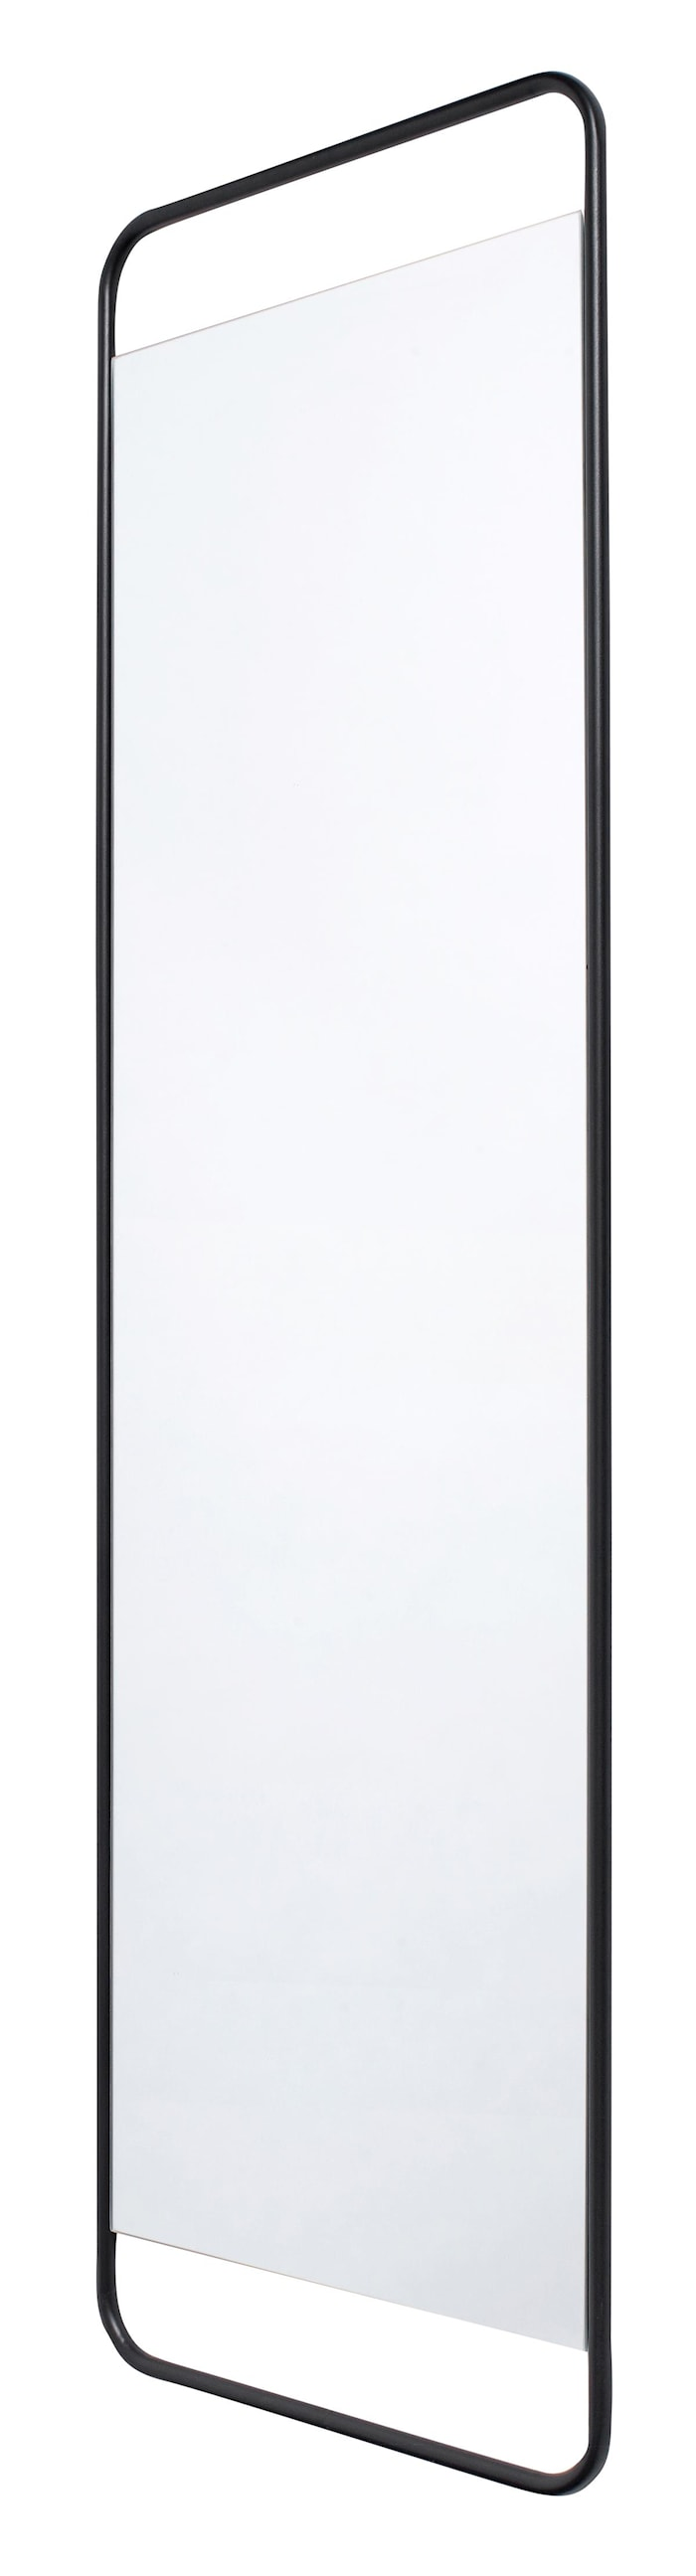 Copenhagen Vægspejl 49,5x166x1,5 cm